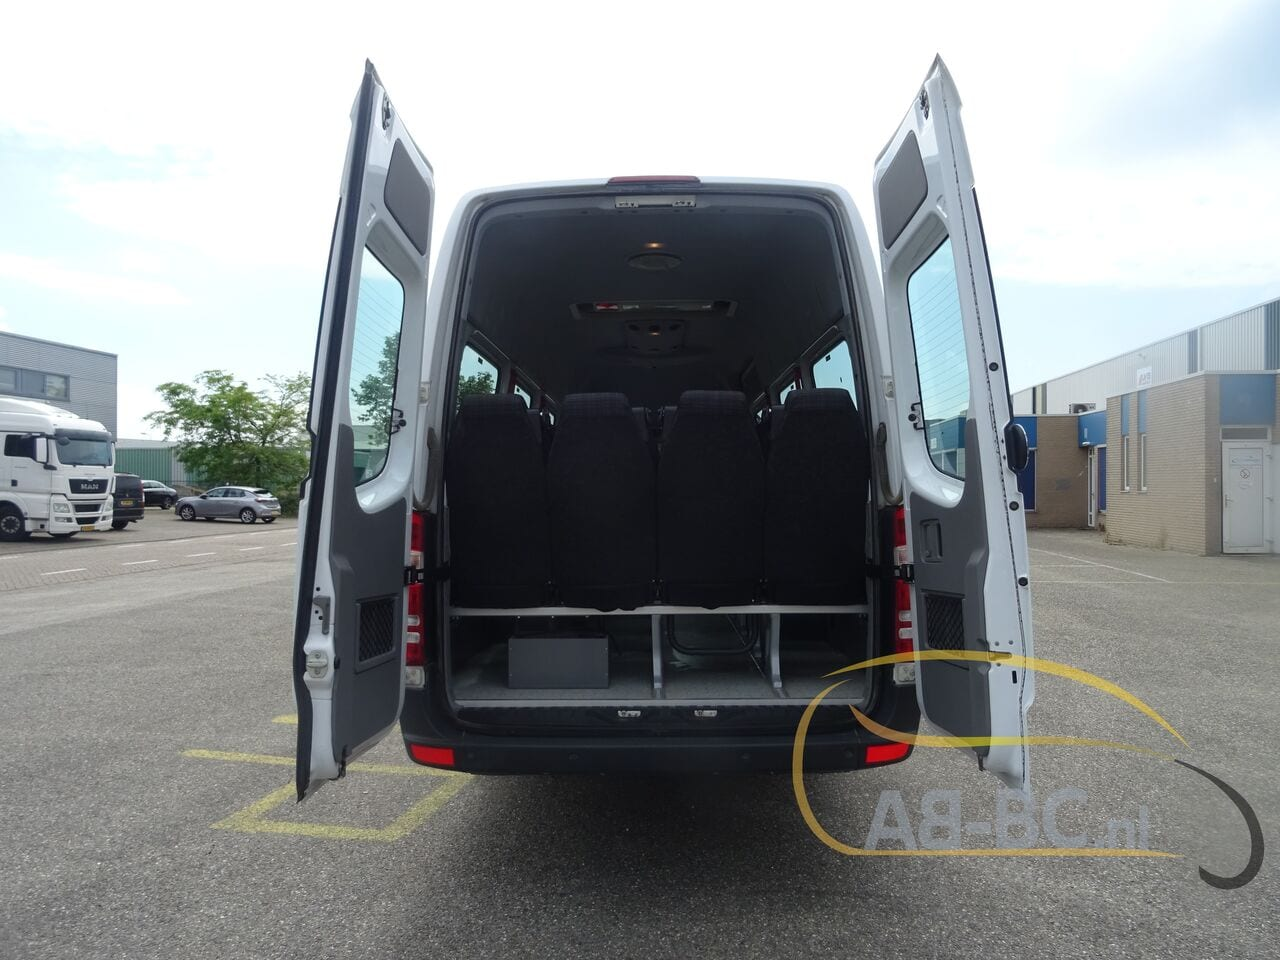 coach-busMERCEDES-BENZ-516-CDI-Sprinter-Transfer-45-23-Seats-EURO-6---1625493796216333620_big_a8d96254575a3677db255bcf0332c4bd--21060112394245379500